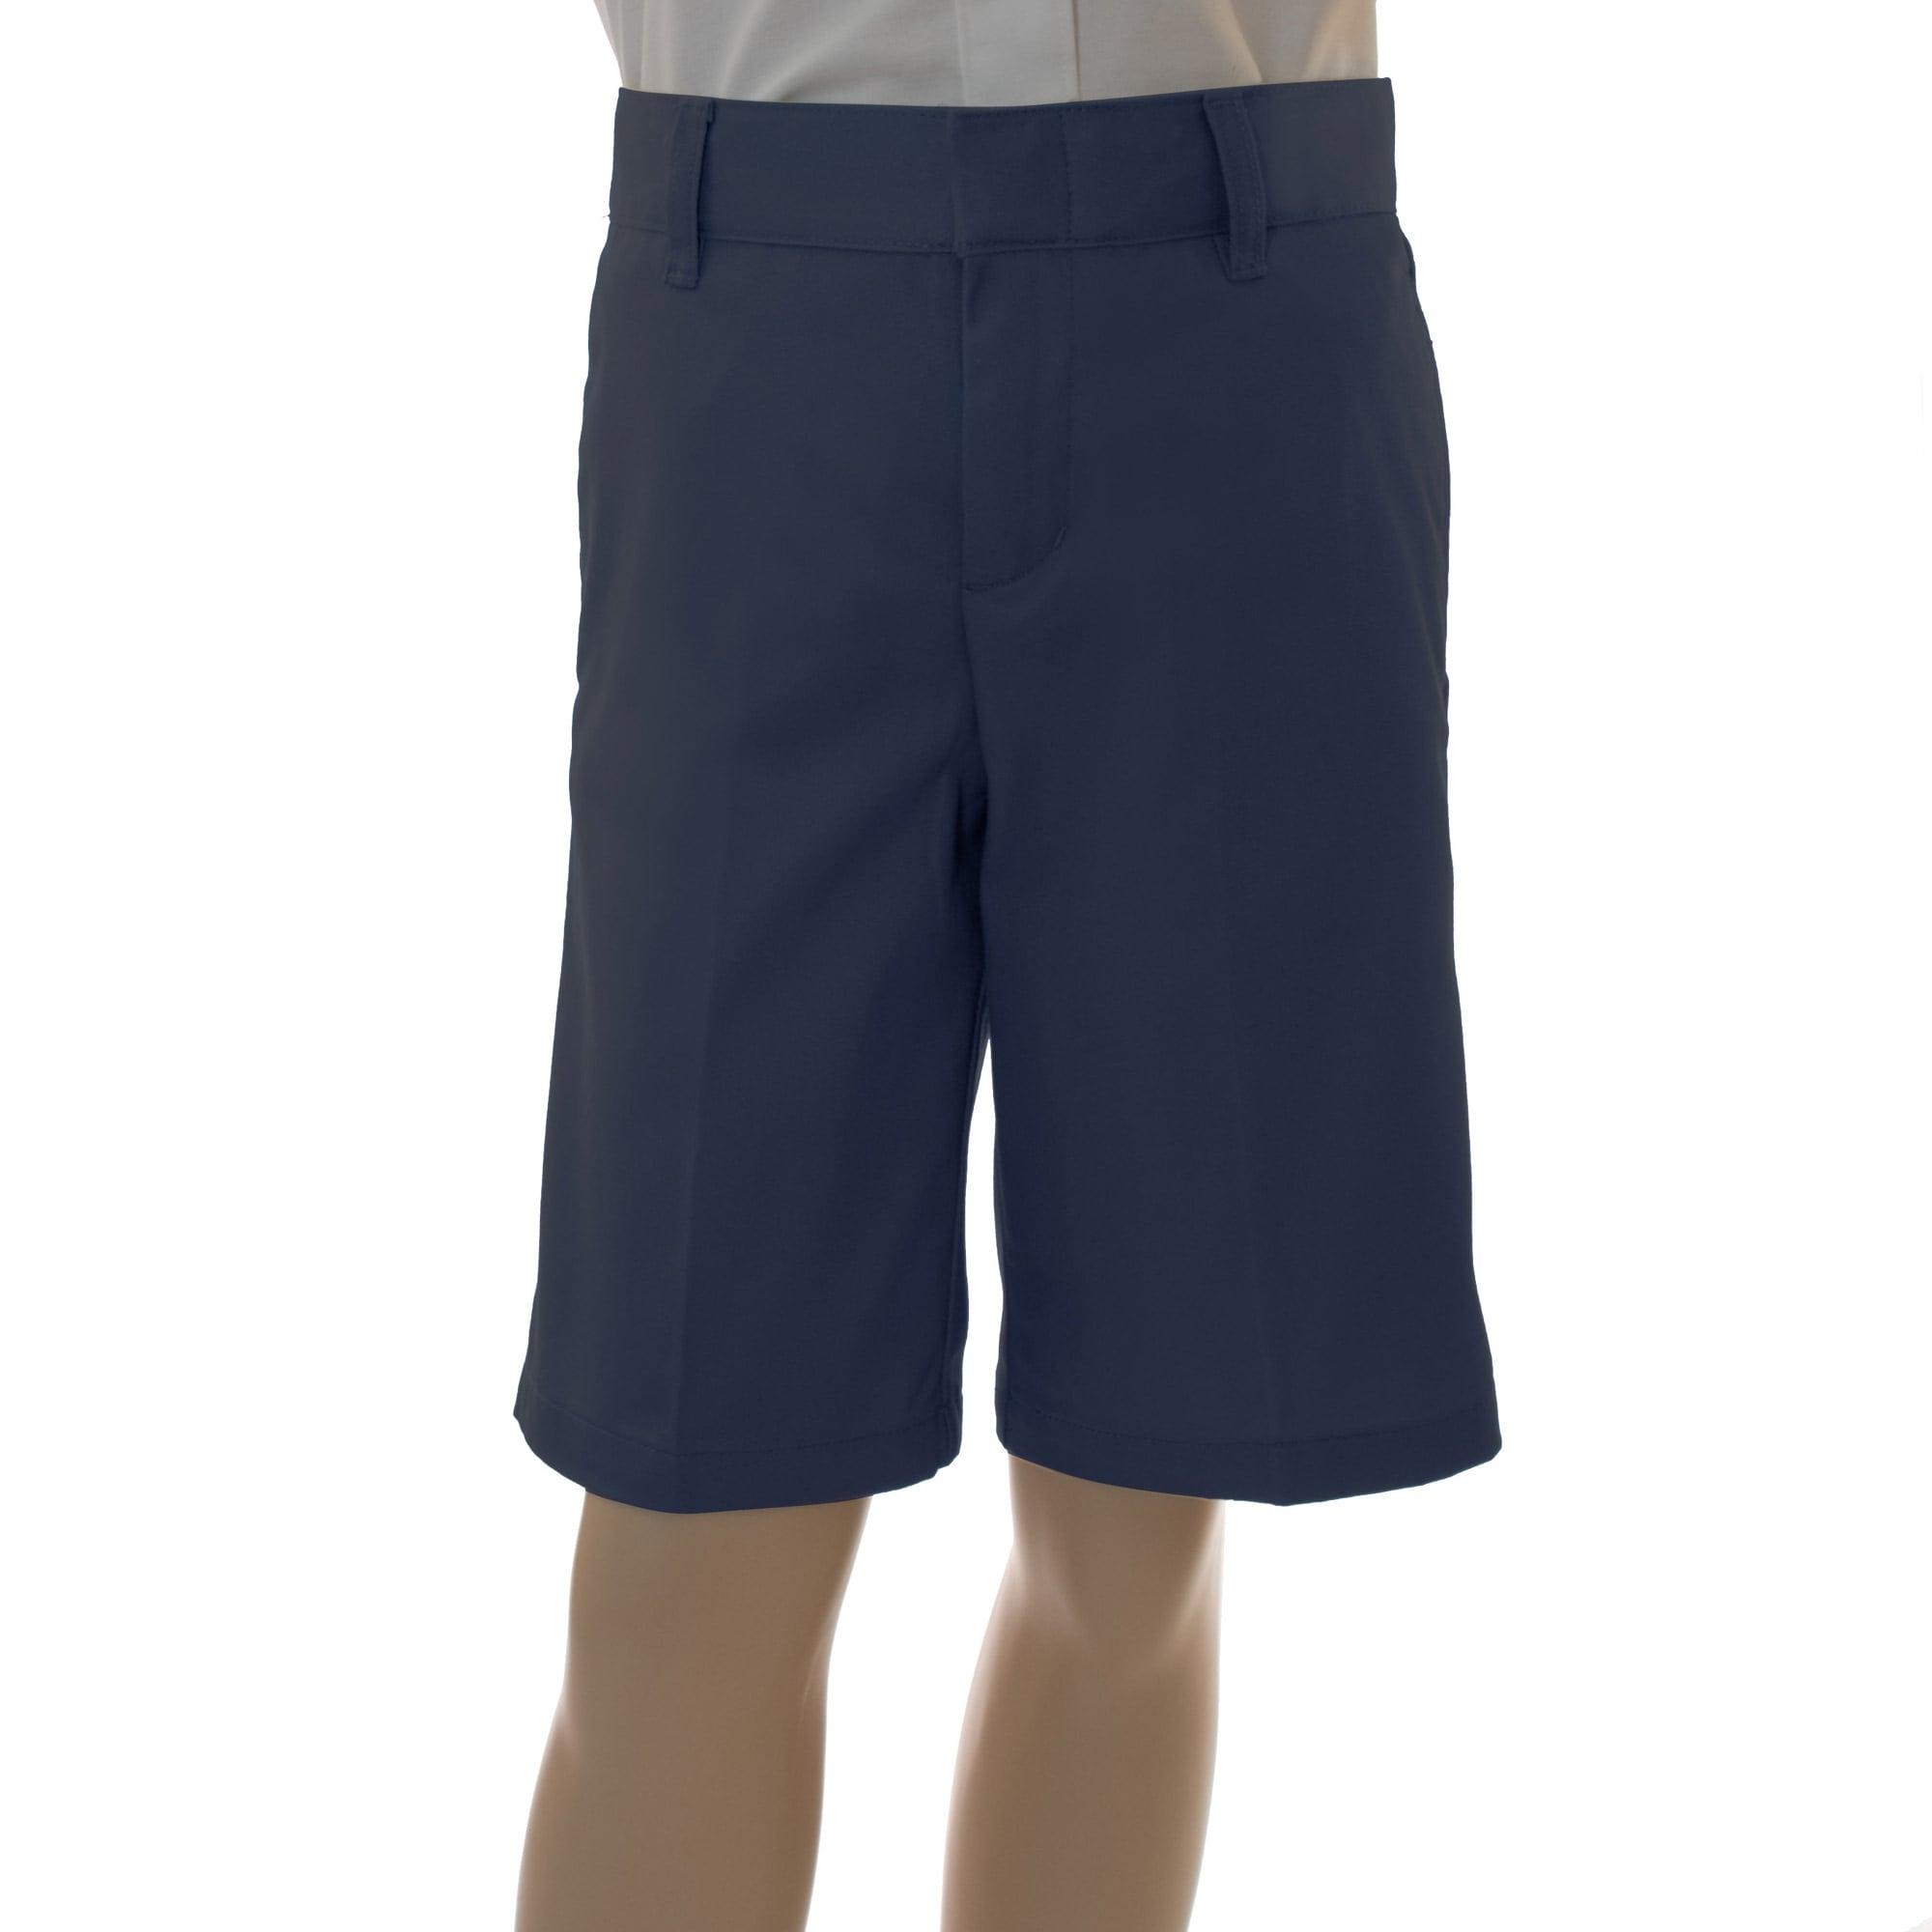 French Toast Boy's School Uniform Shorts (Set of 2)